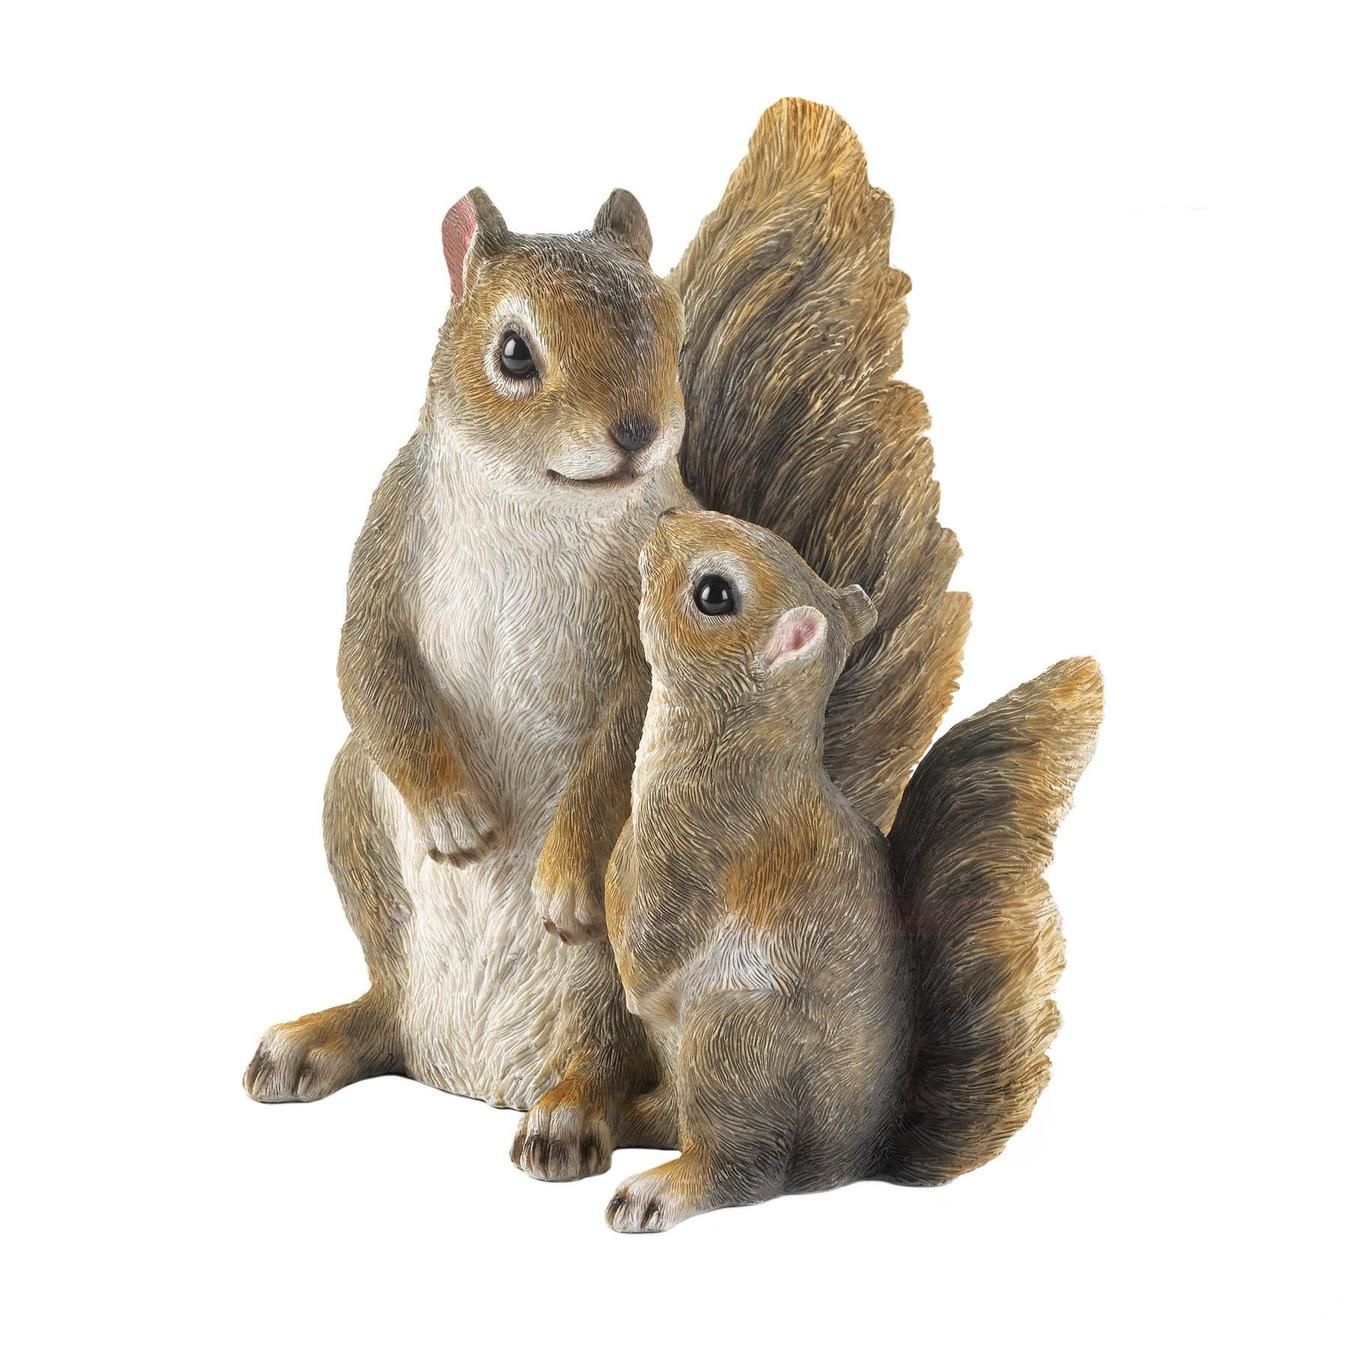 Mommy Me Squirrel Figurine Coristel Home Decor In 2020 Squirrel Figurine Baby Squirrel Squirrel [ 1350 x 1350 Pixel ]